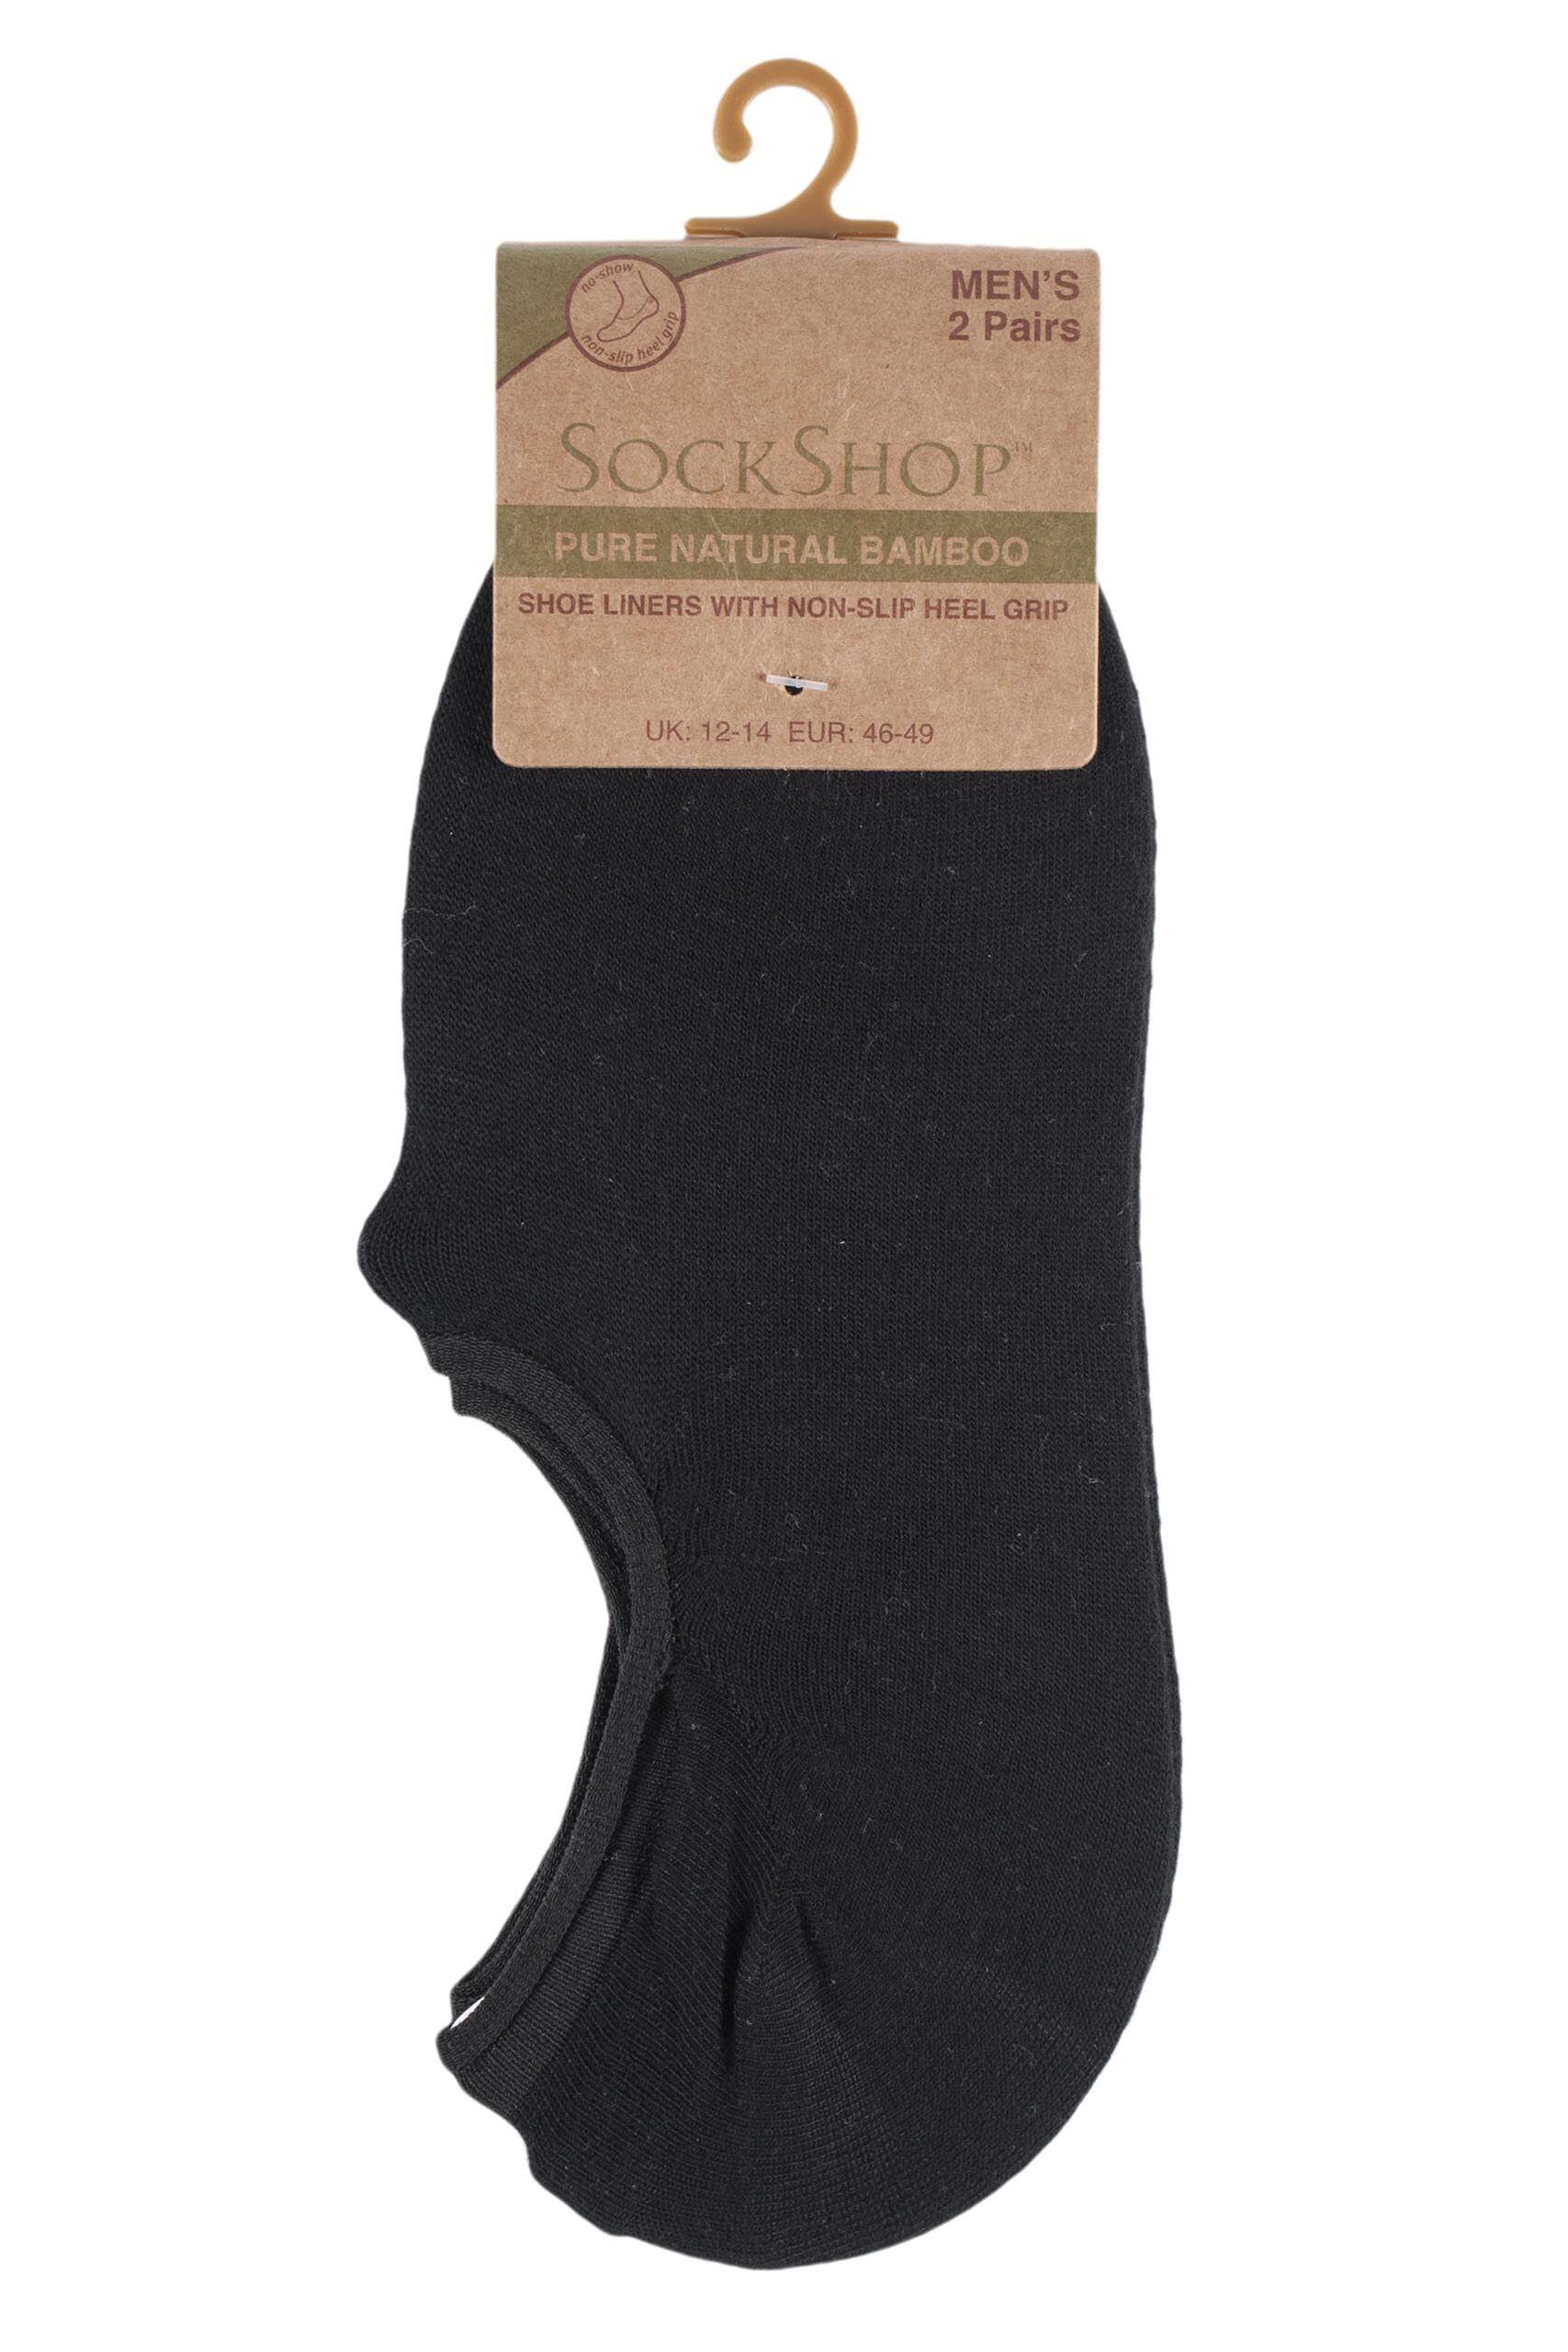 Mens SockShop Plain Bamboo Shoe Liner Socks From SockShop